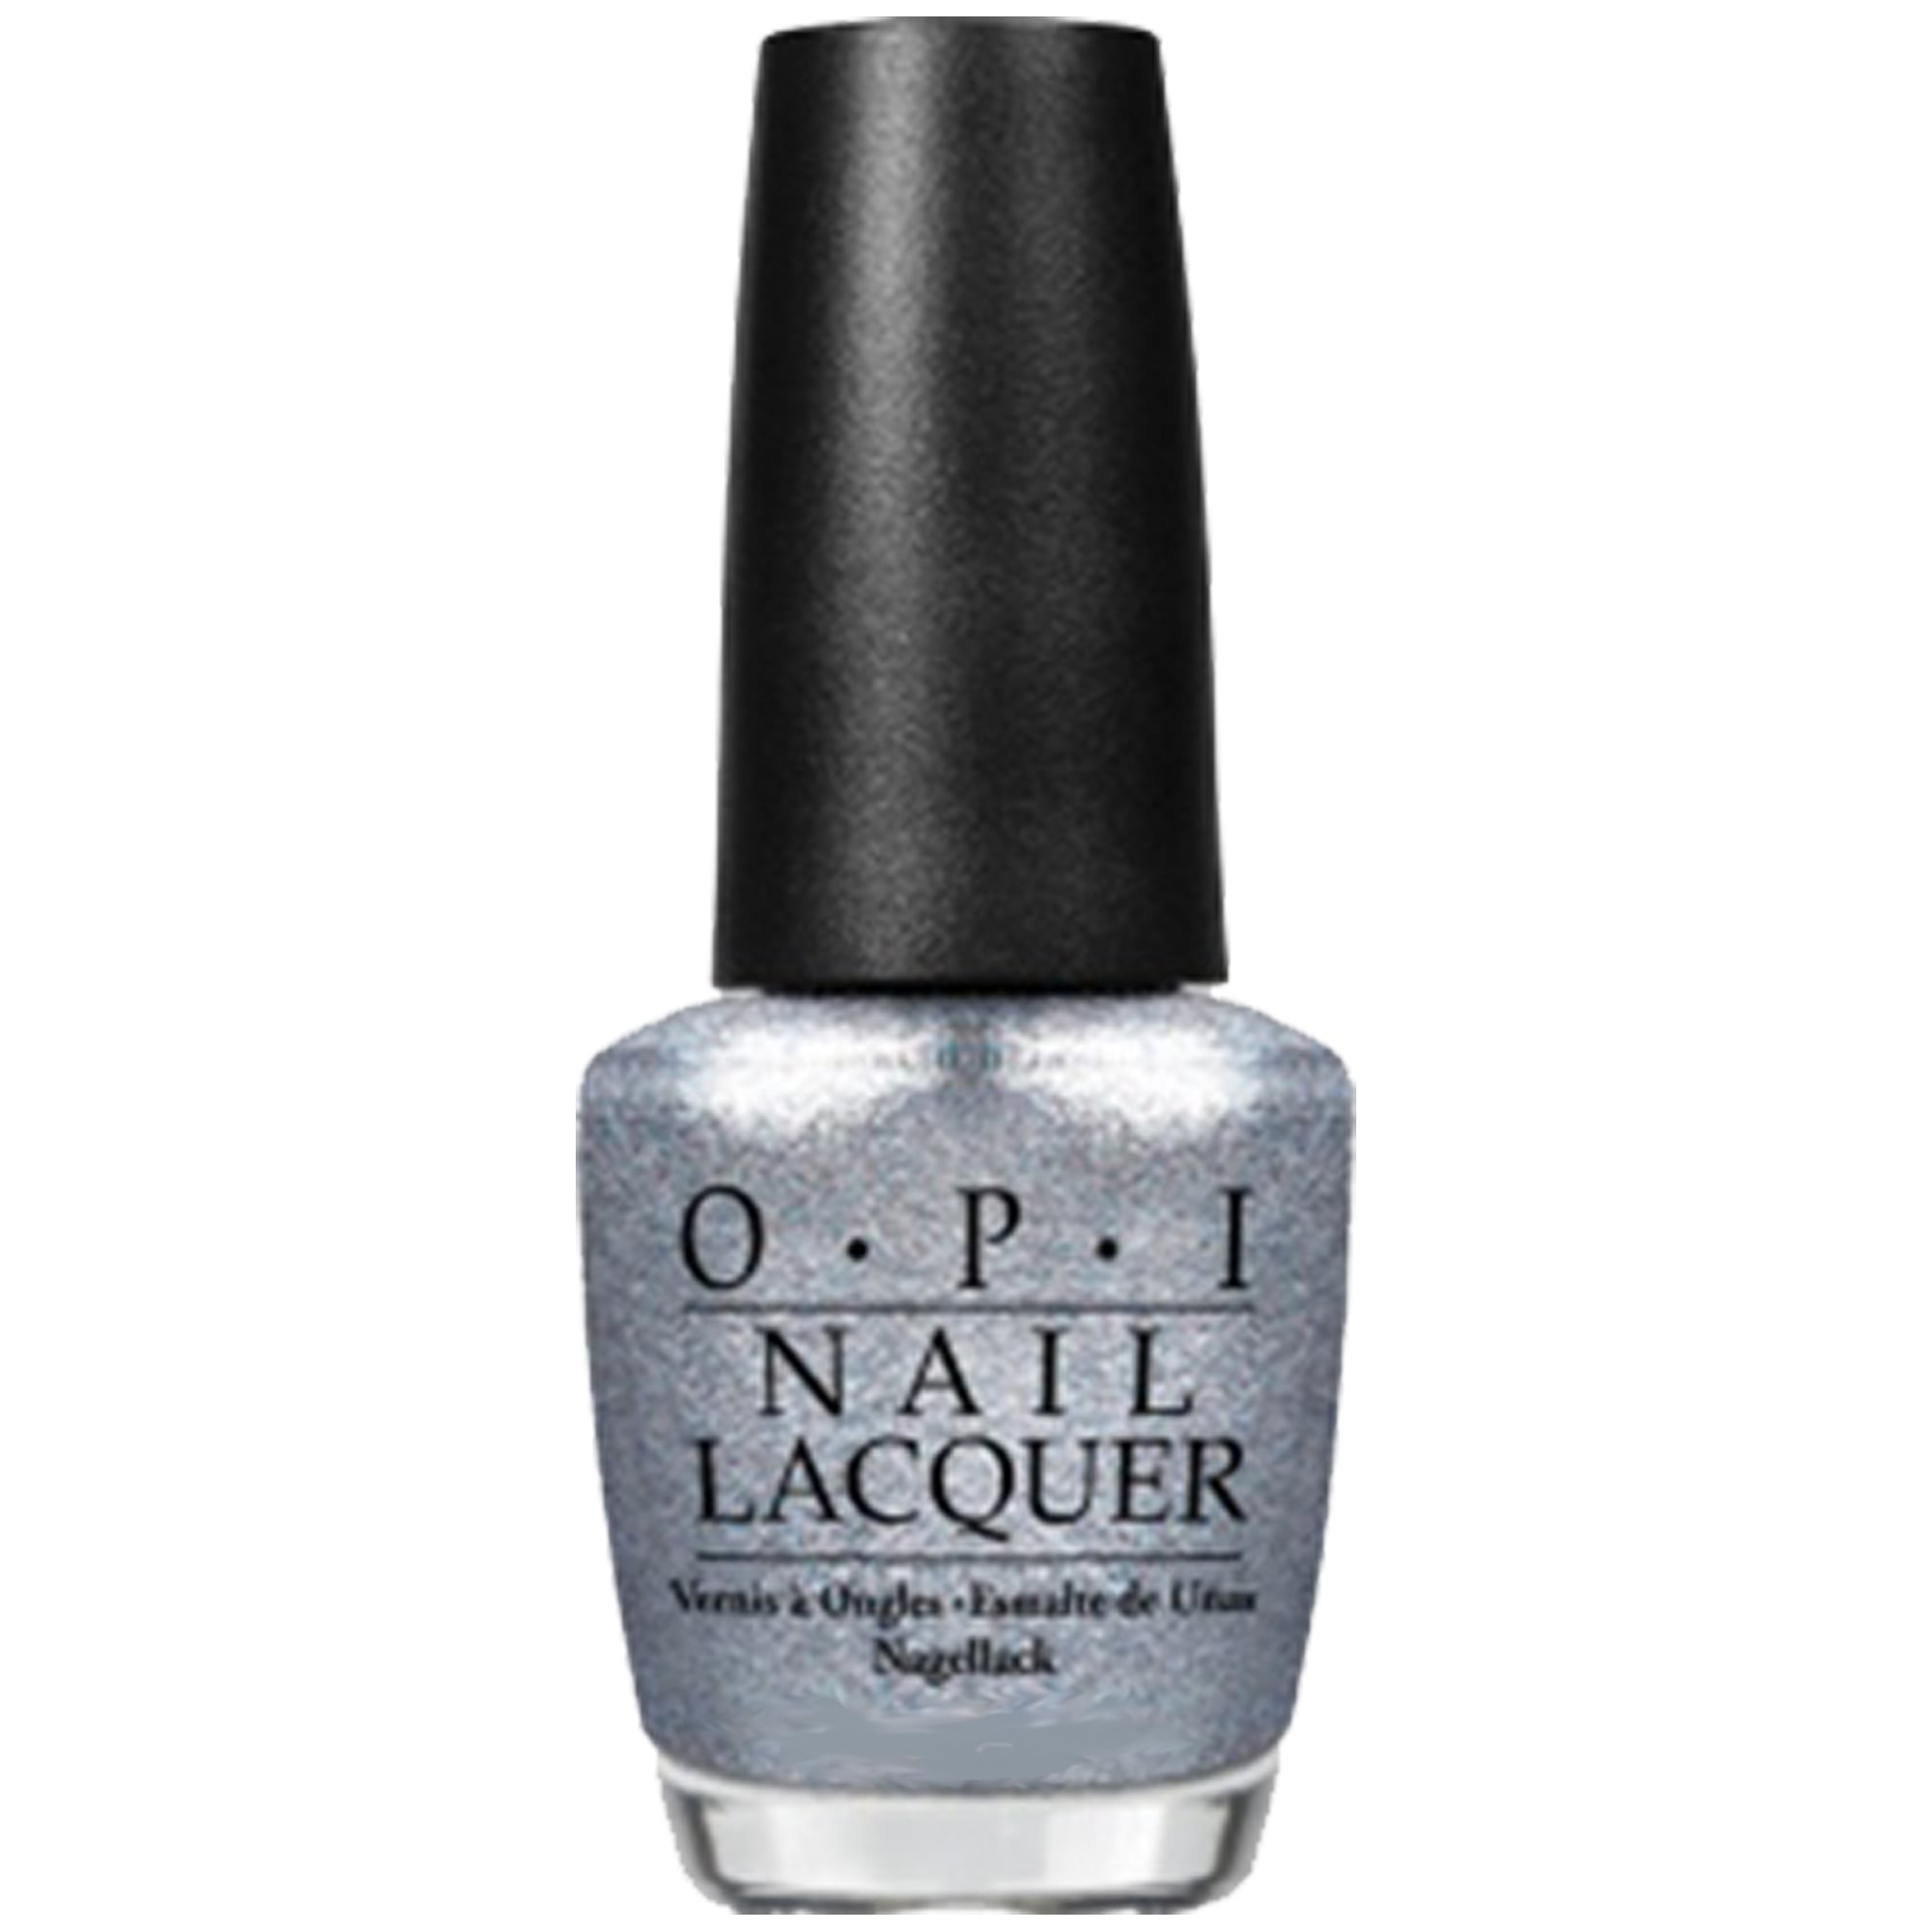 OPI 50 Shades Of Grey 2015 Nail Polish Collection - Shine For Me 15ml